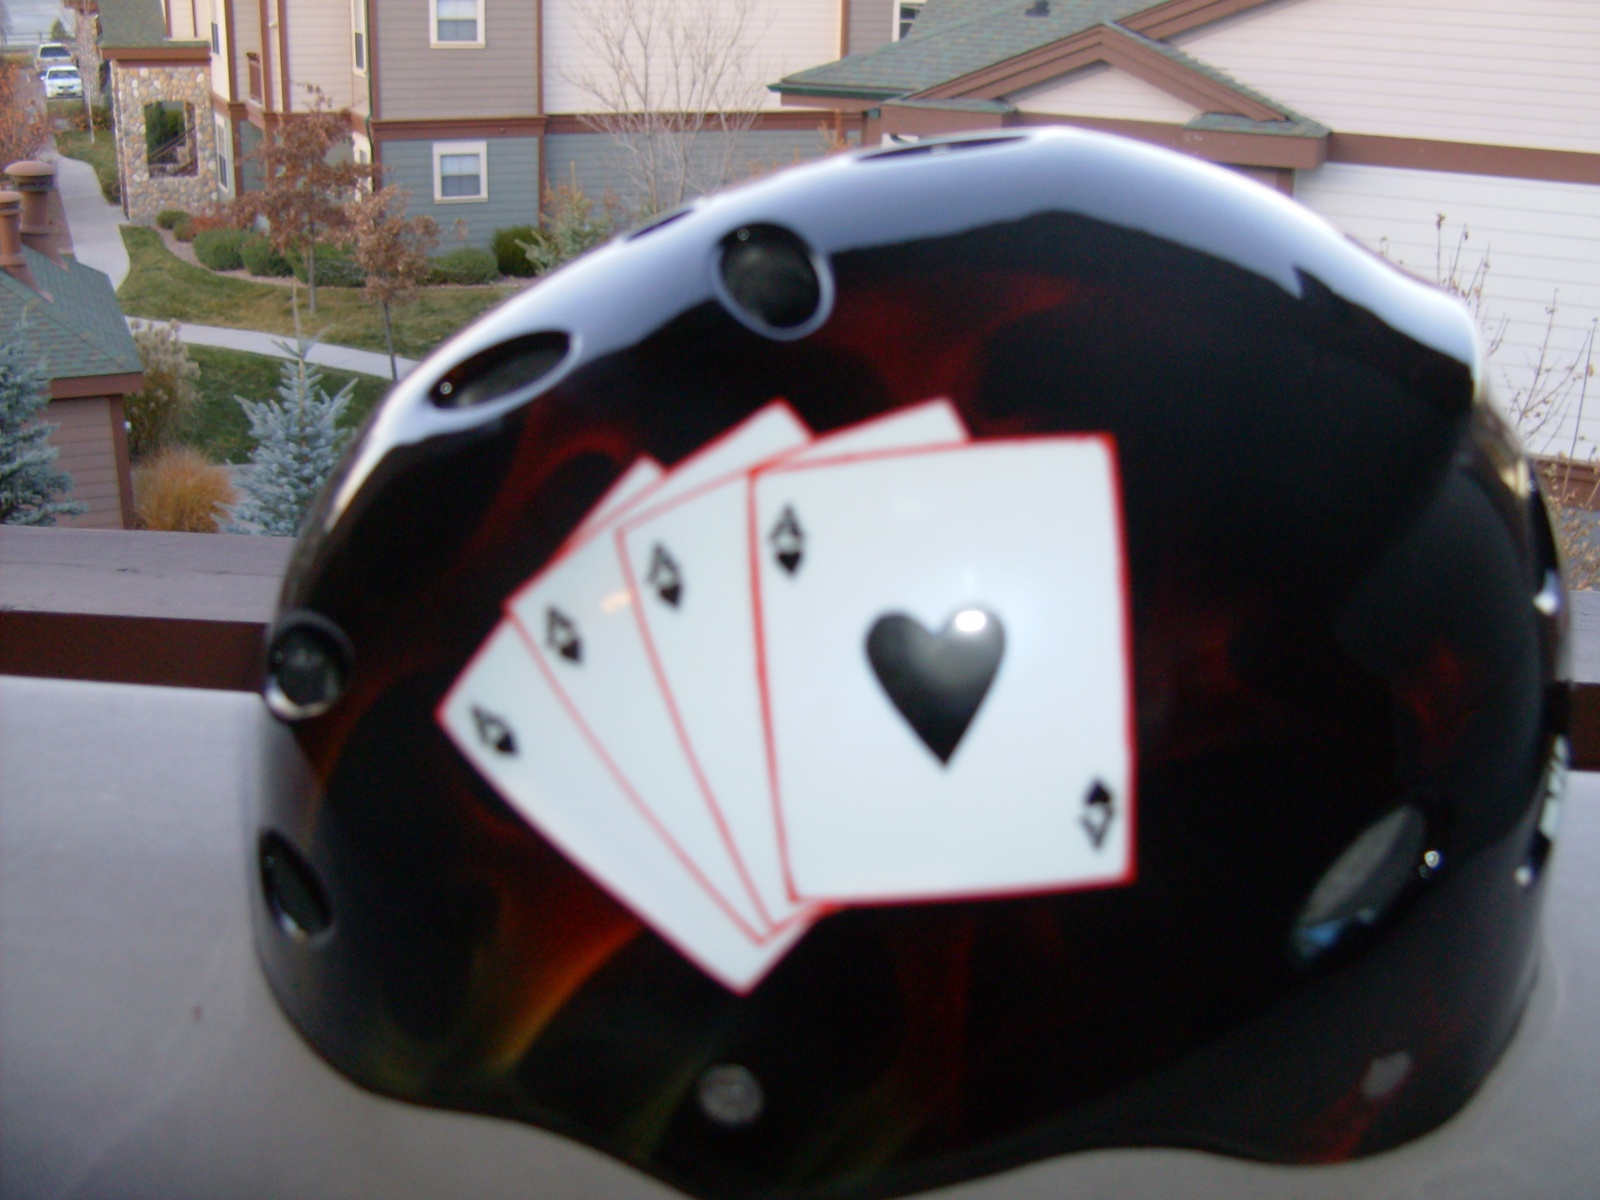 Click image for larger version  Name:Custom kayak helmet 004.jpg Views:292 Size:408.5 KB ID:850